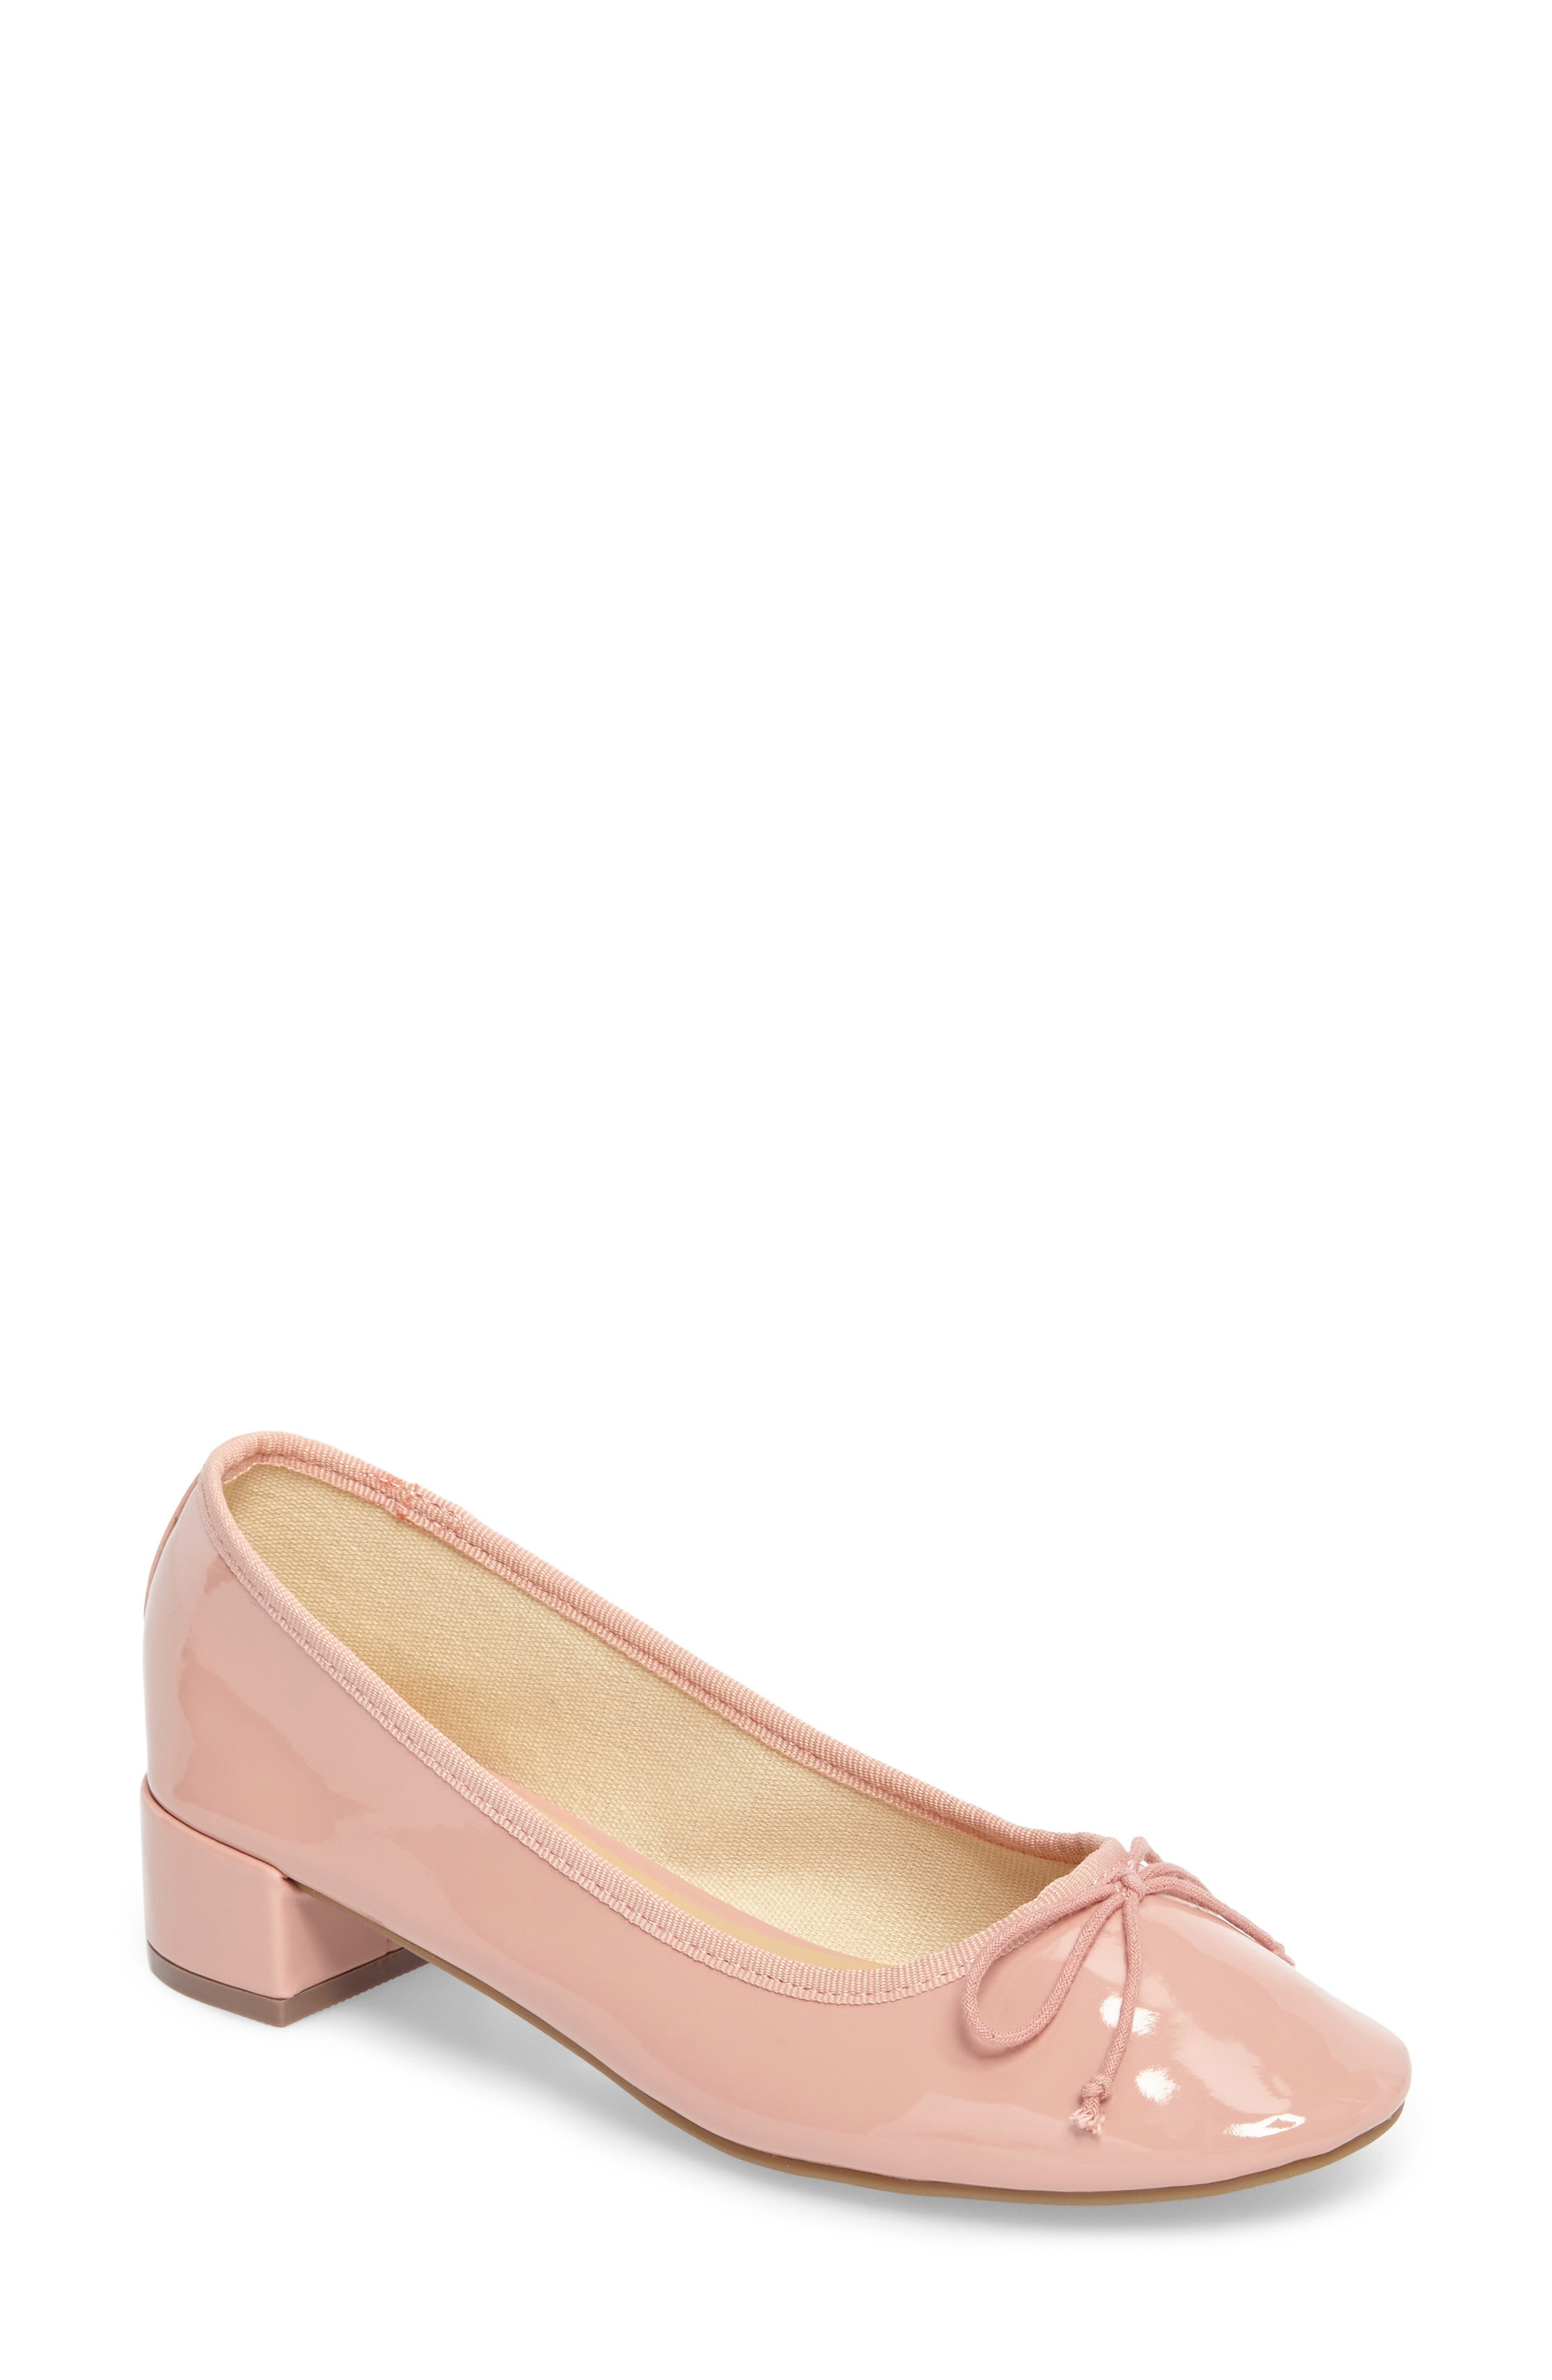 Glory Heeled Ballerina Slippers,                         Main,                         color, 650